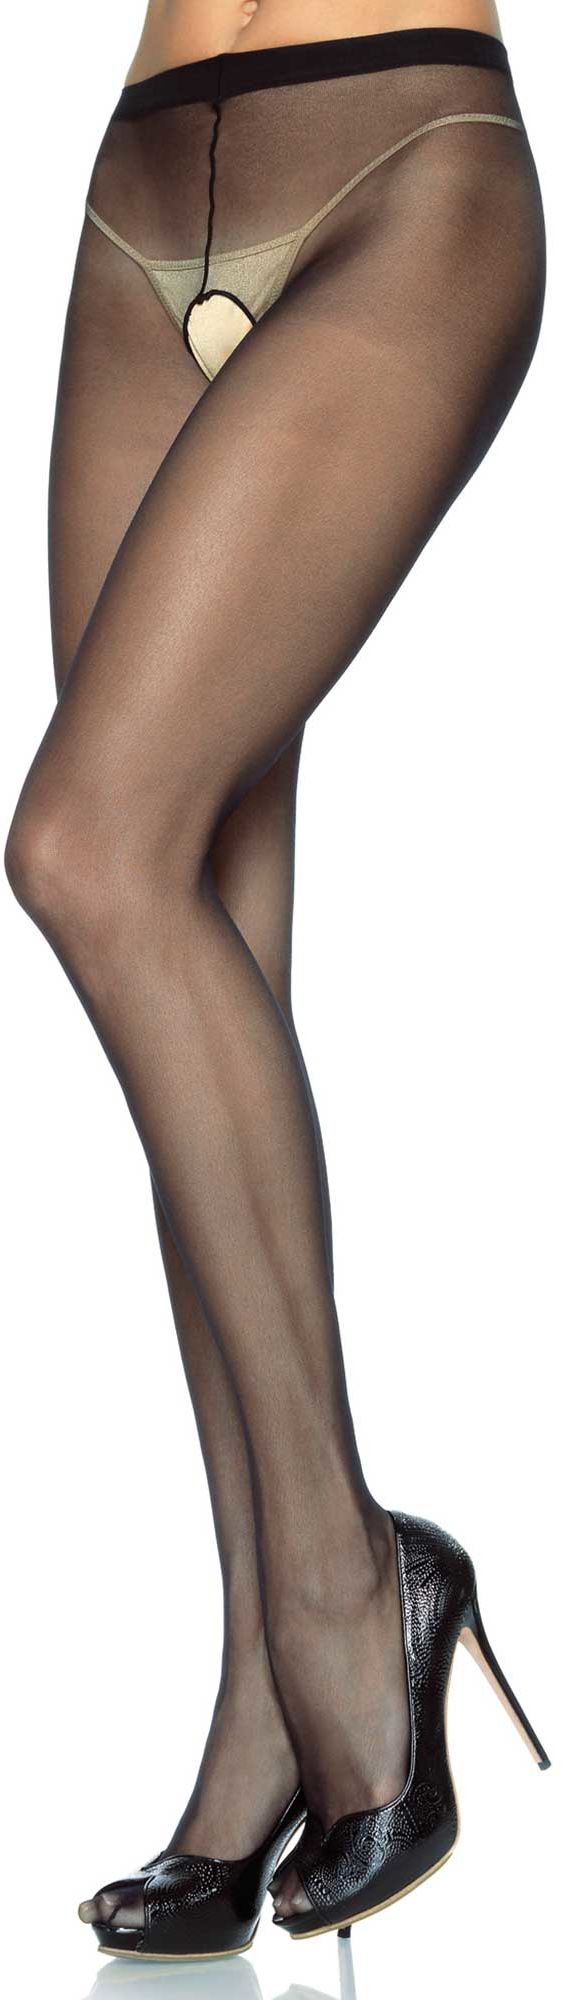 Leg Avenue Sheer Crotchless Pantyhose 1905 Black